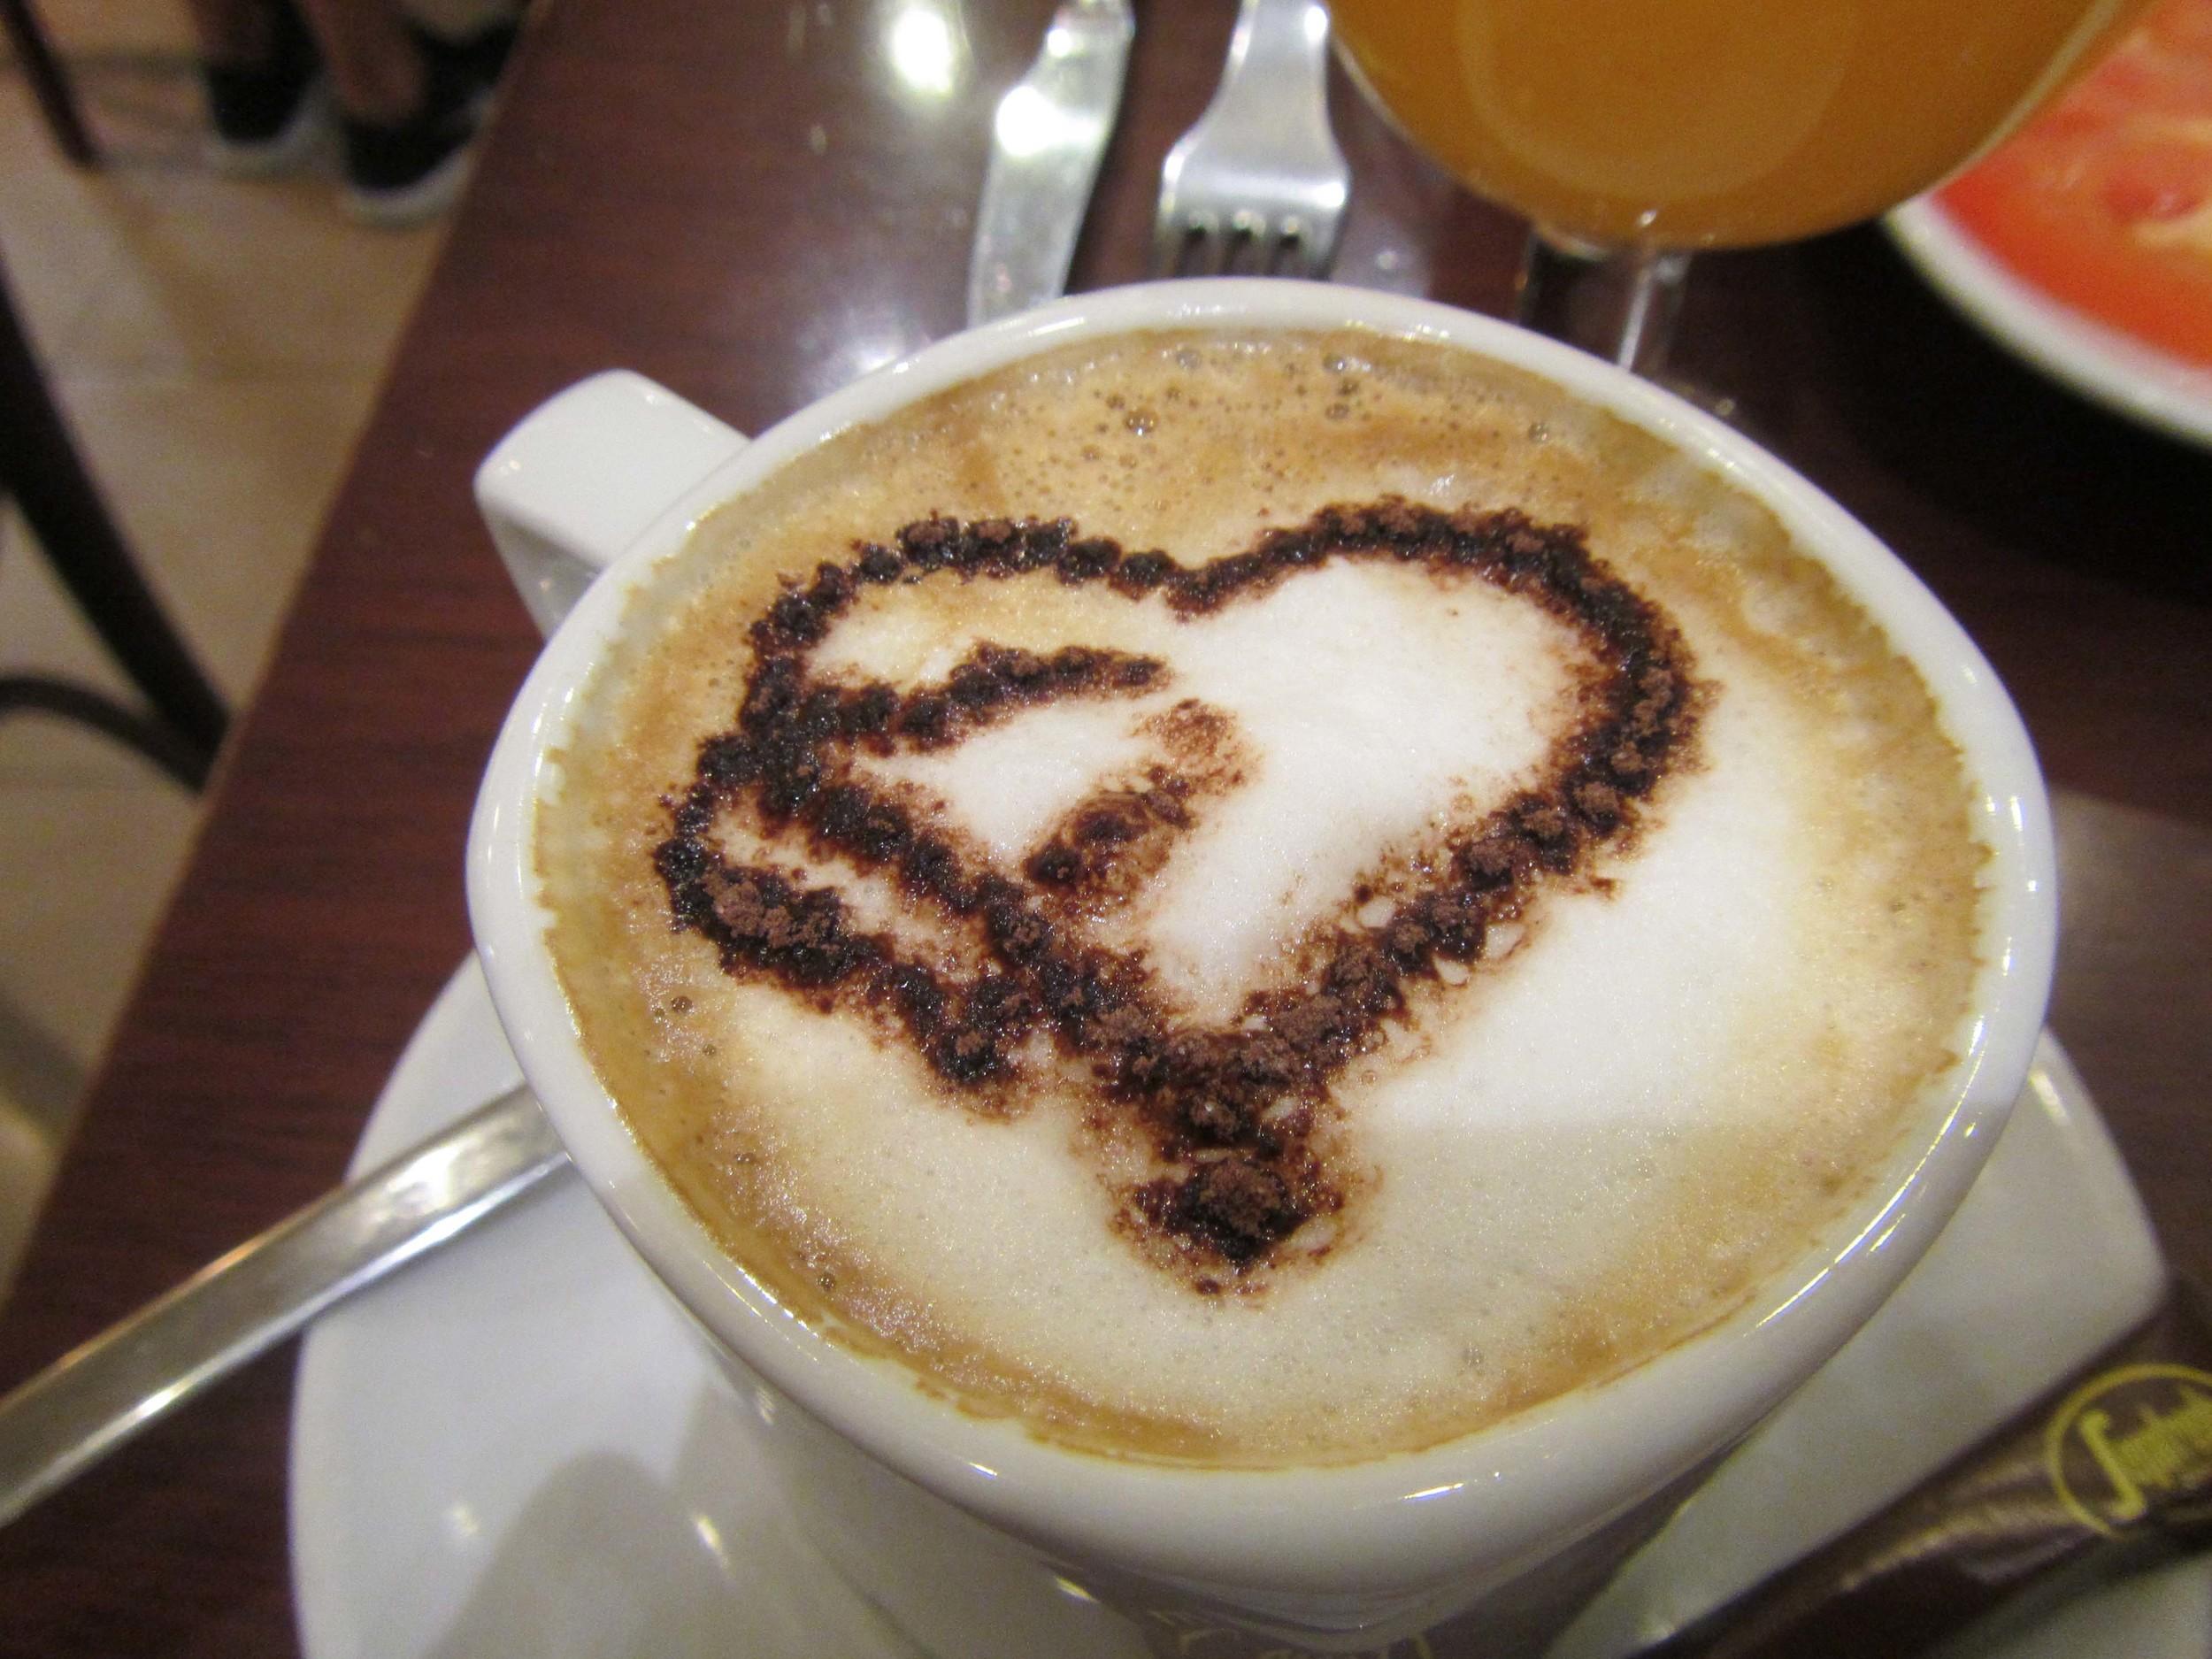 Aaron's coffee at breakfast